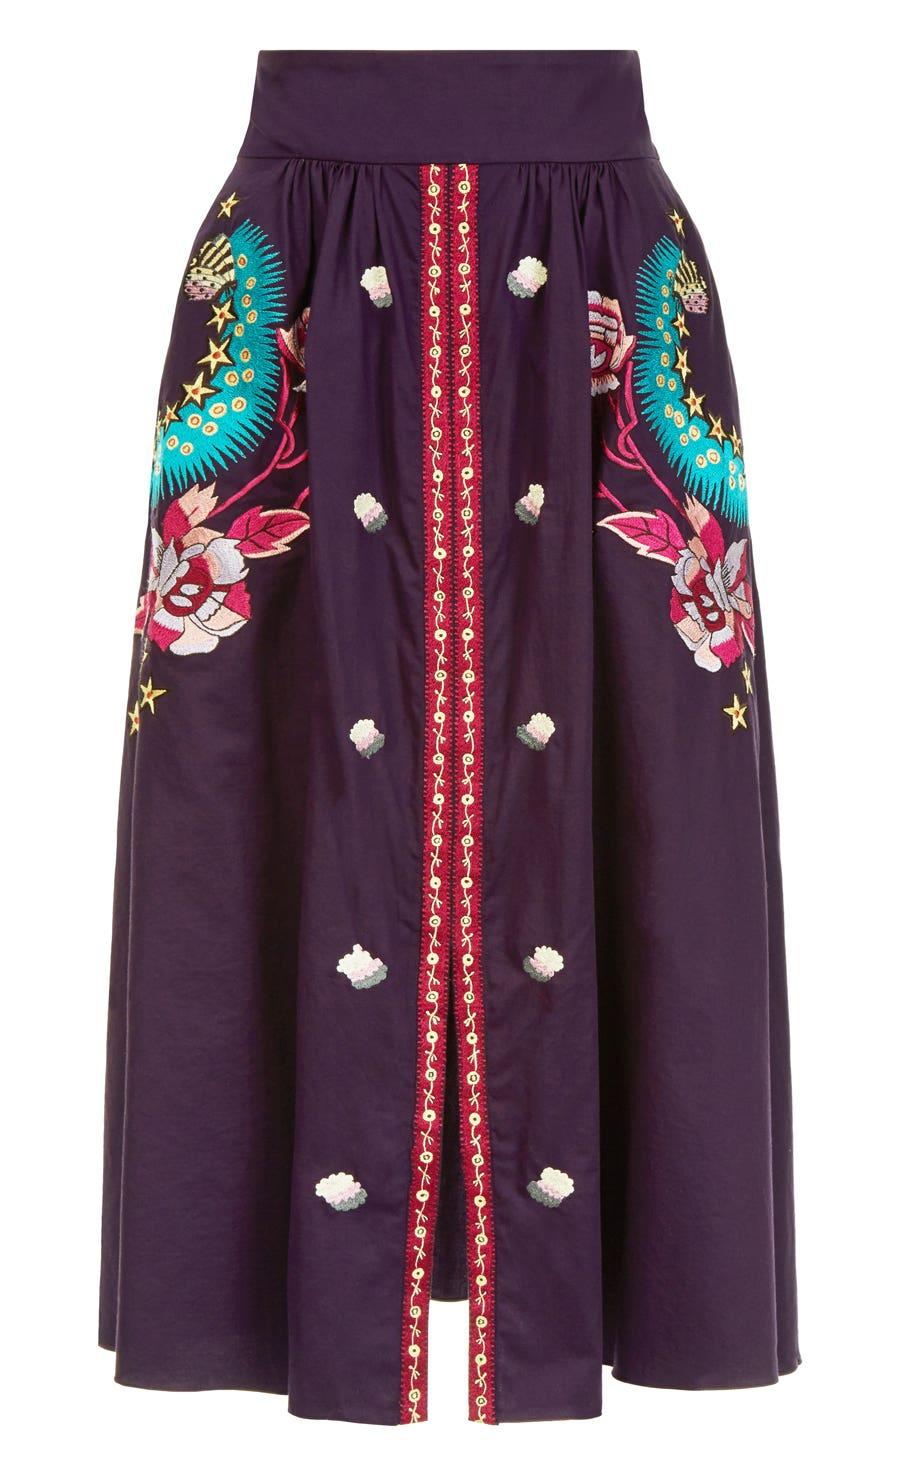 Peacock Skirt, Aubergine Mix